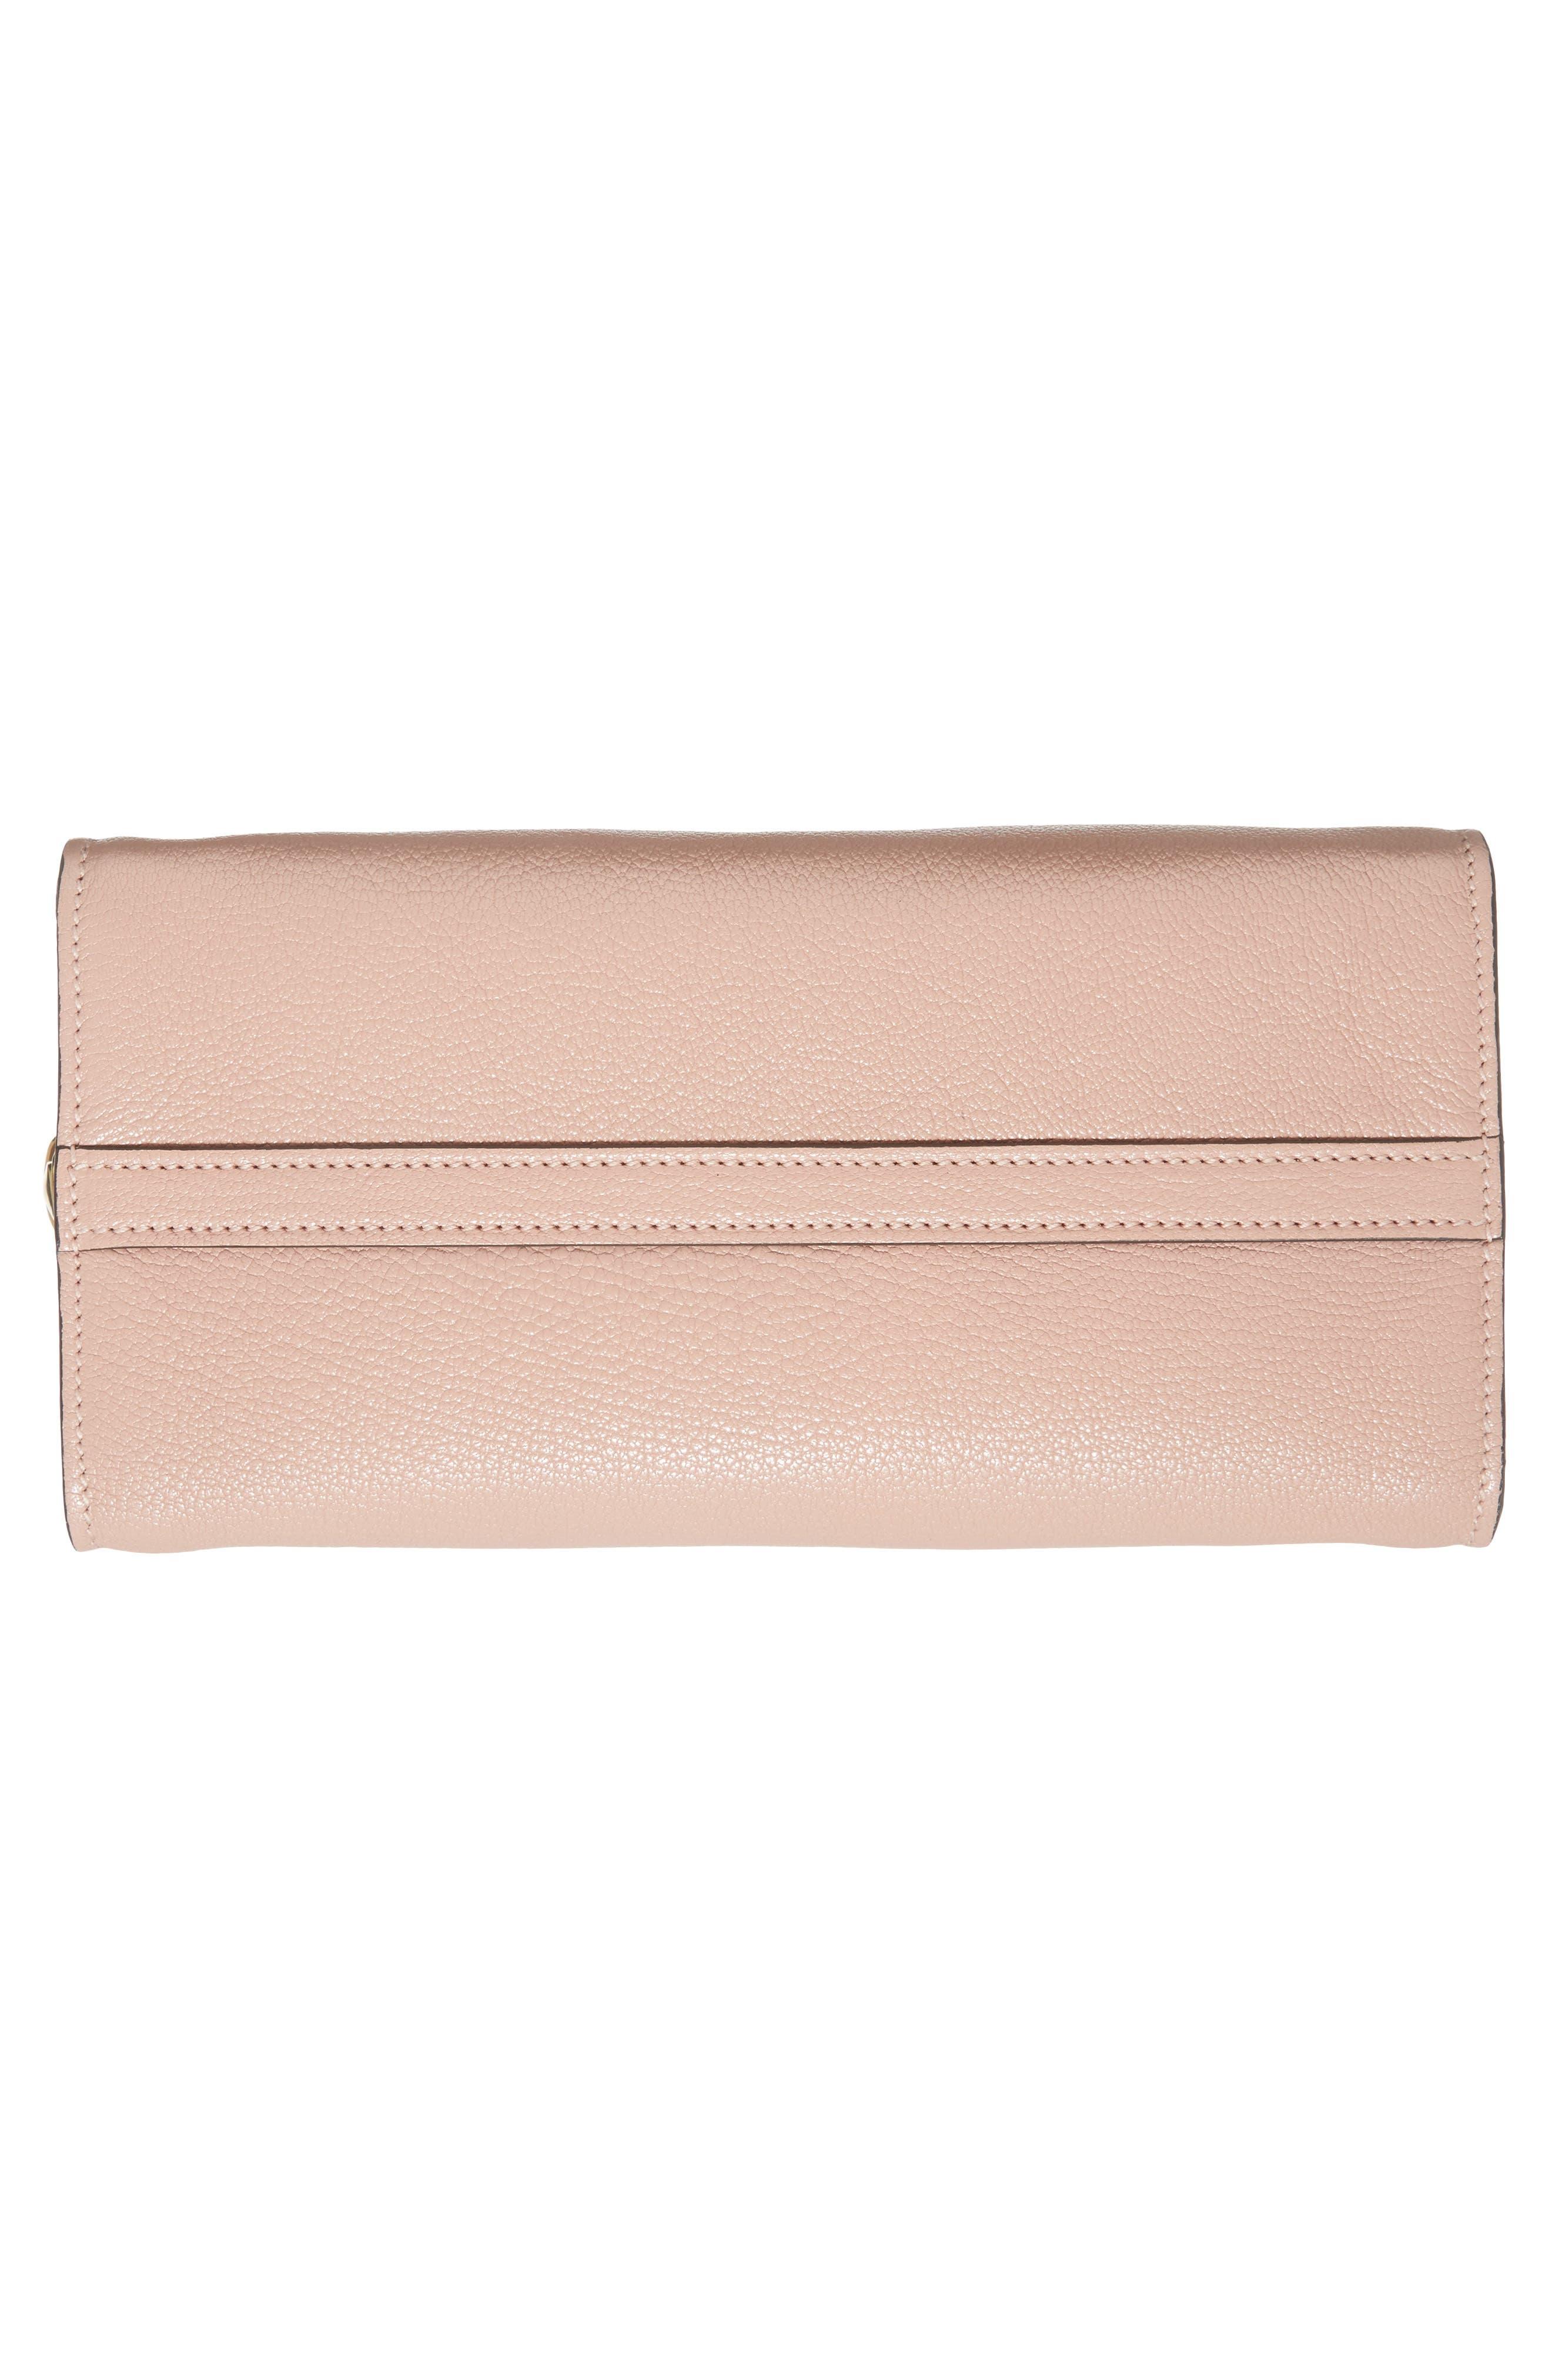 Madras Ficco Leather Satchel,                             Alternate thumbnail 6, color,                             652